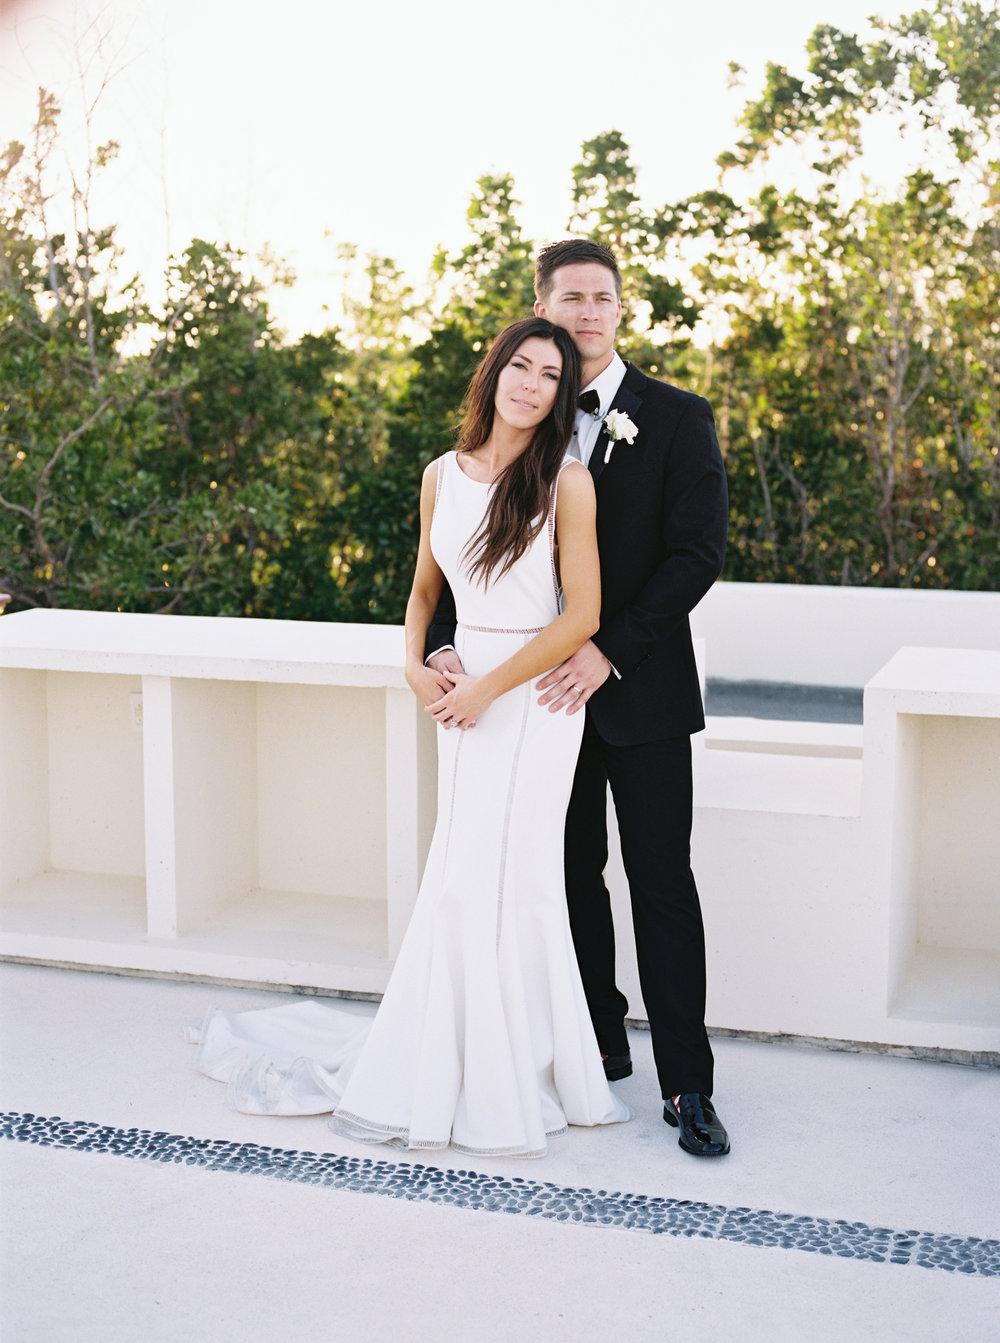 Kyle John l Fine Art Wedding Photography l Chicago, Copenhagen, California, New York, Destination l Blog l Brooke Boyd_The Film Poets_Tulum Wedding_29